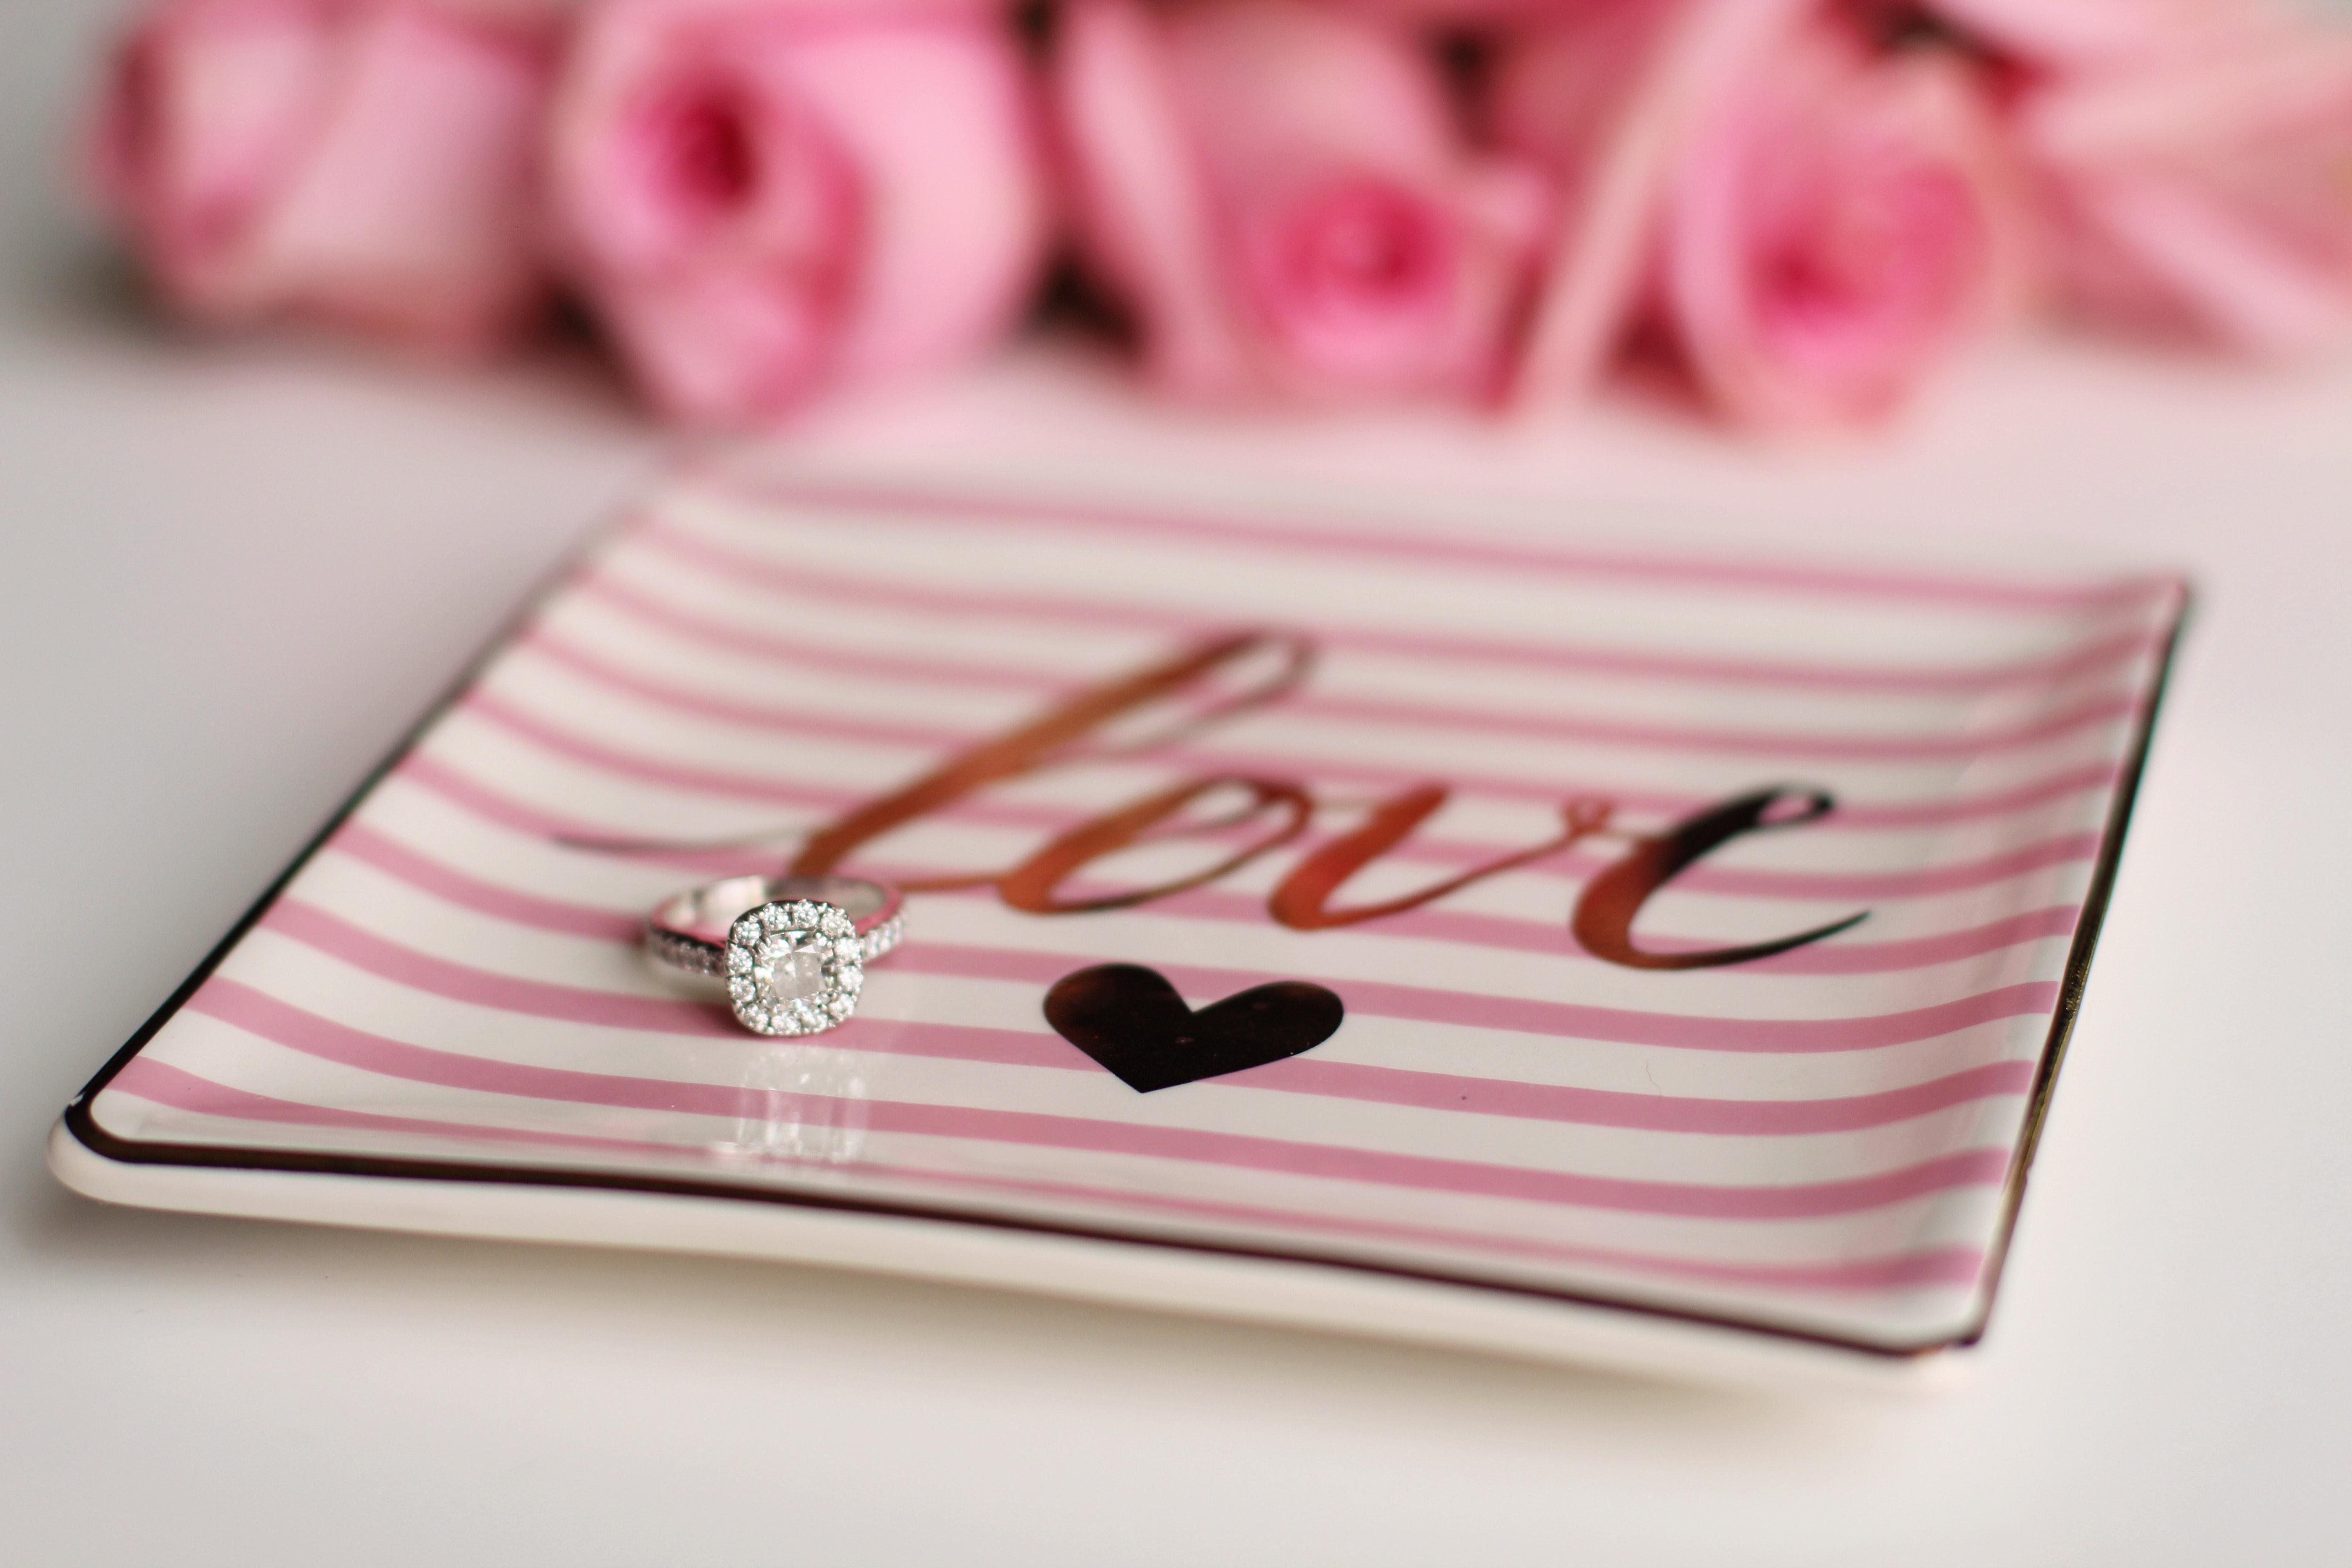 500+ Beautiful Engagement Ring Photos · Pexels · Free Stock Photos